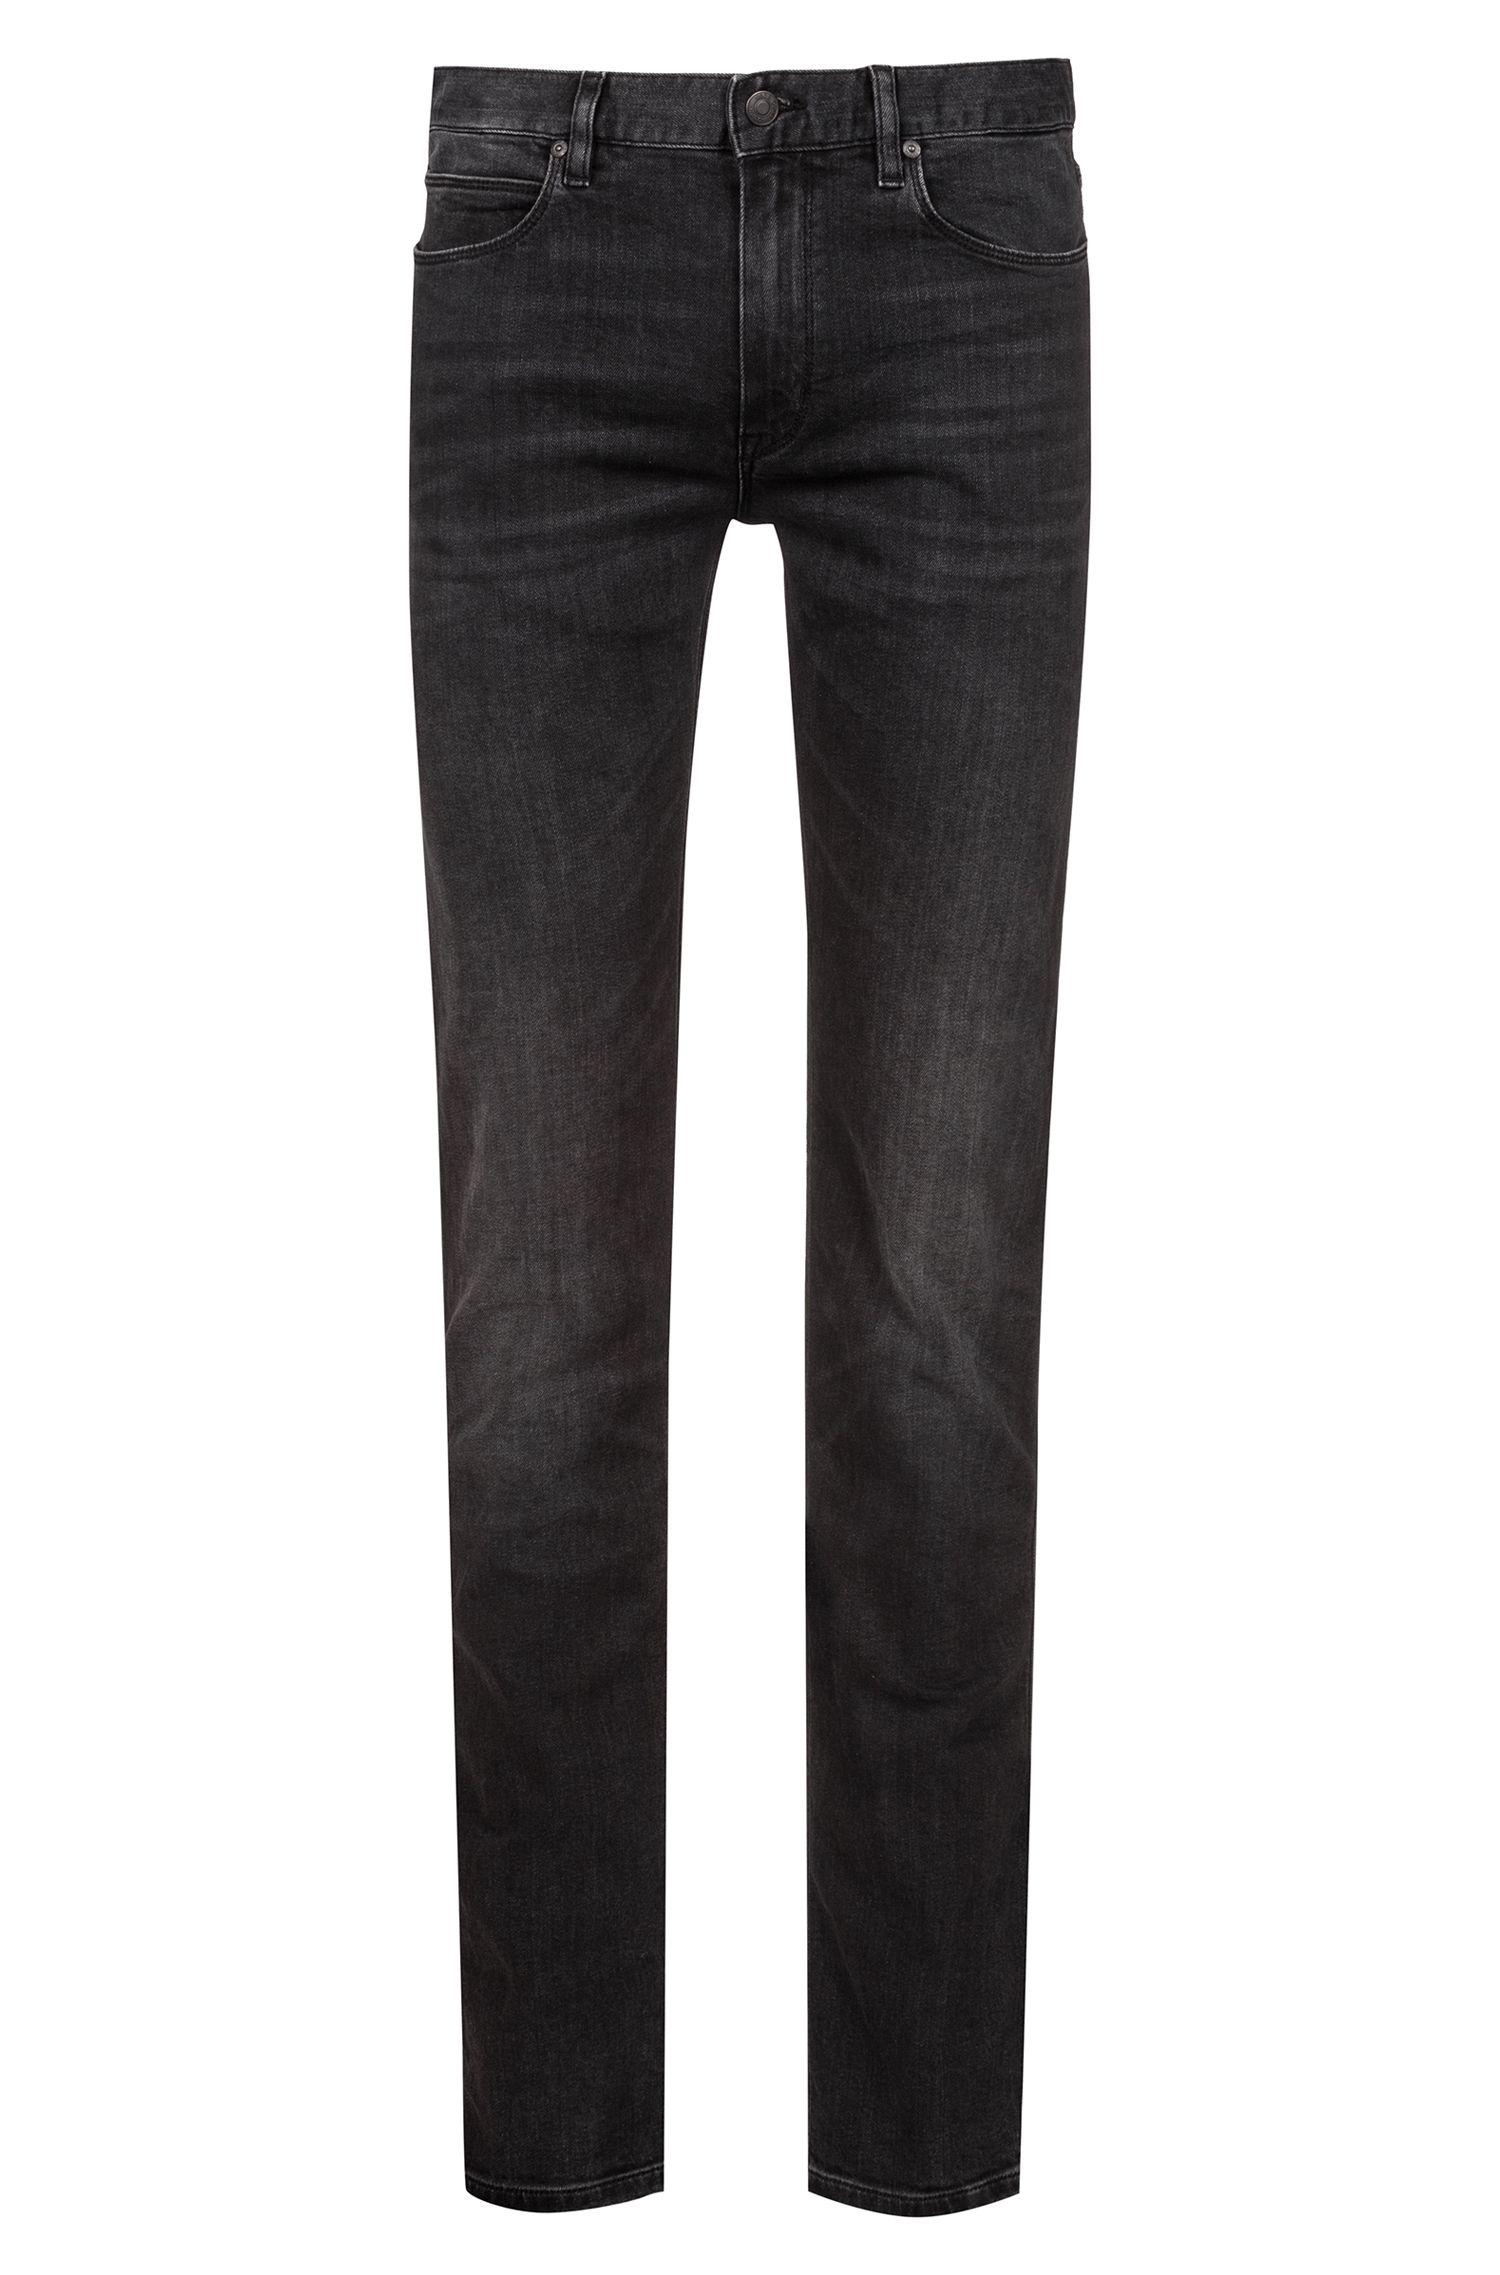 Slim-fit jeans in dark-gray stretch denim